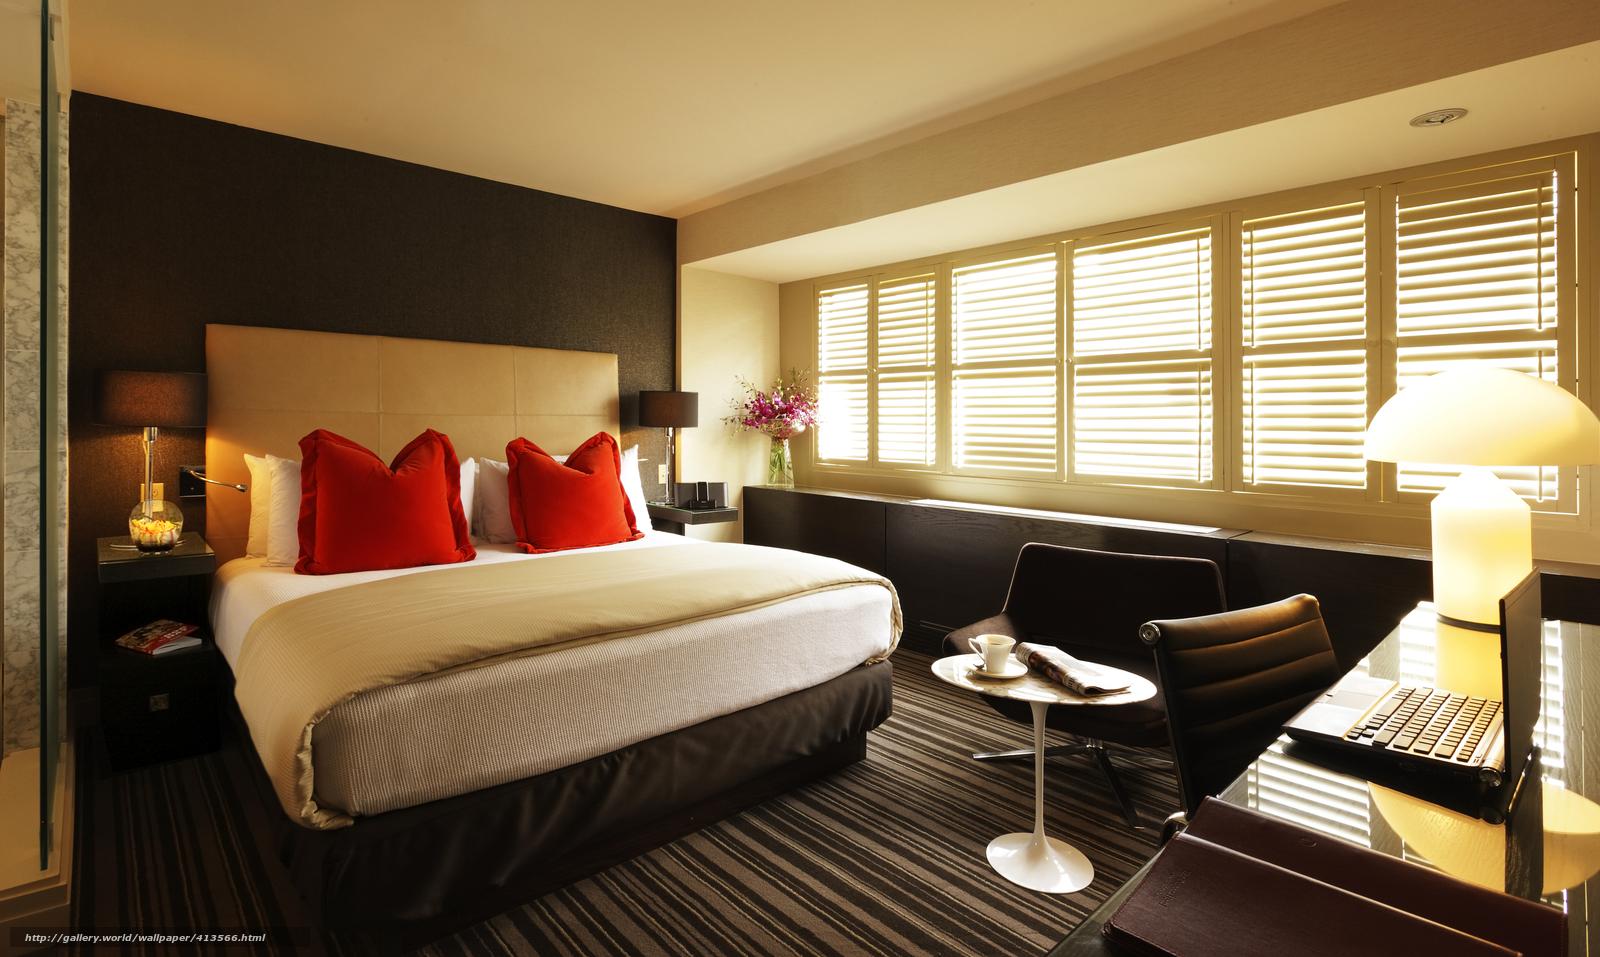 California bedroom sets